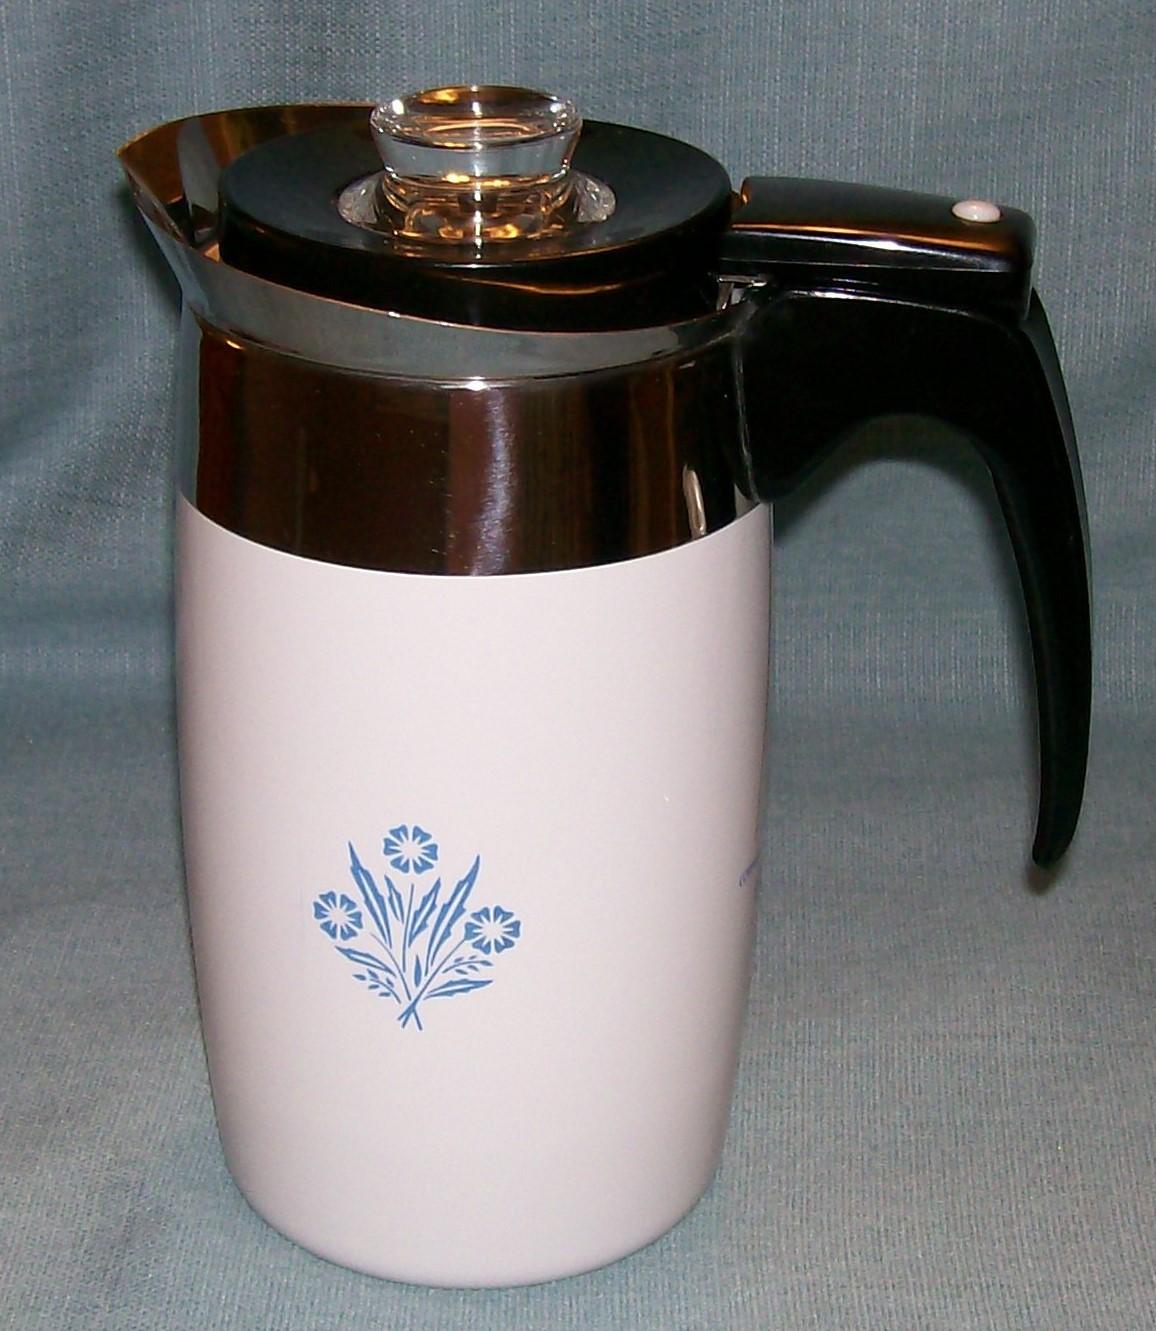 Corning Ware BLUE CORNFLOWER Electric Coffee Pot/Percolator 6 cup P-6-EP VGVC  image 10